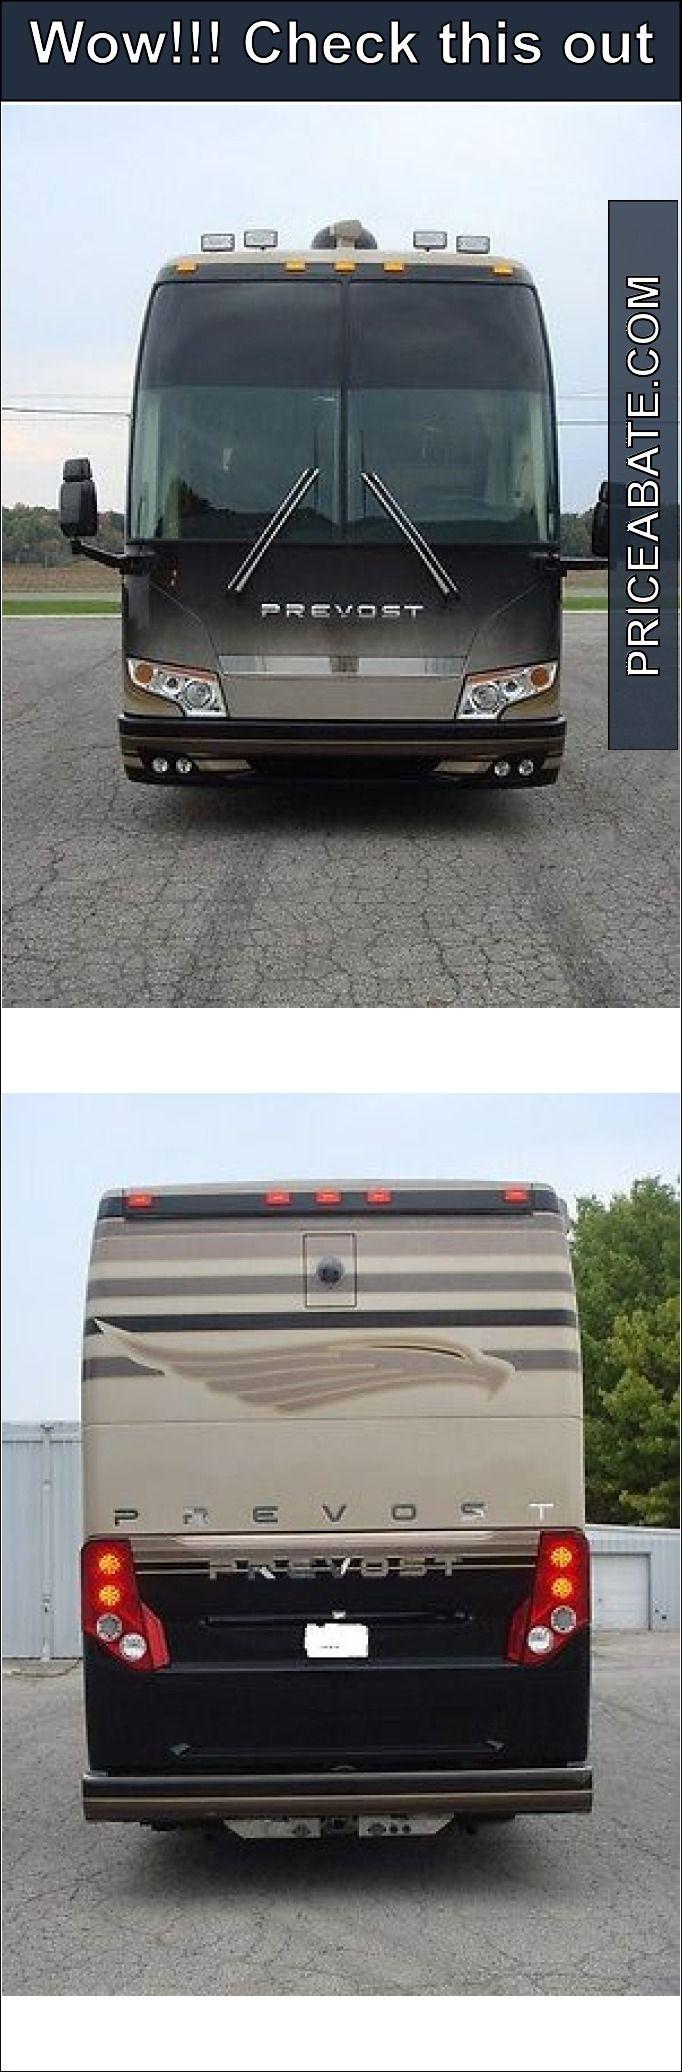 Rvs 1998 Prevost Vantare Motorhome Coach Bus RV Camper Class A RVS